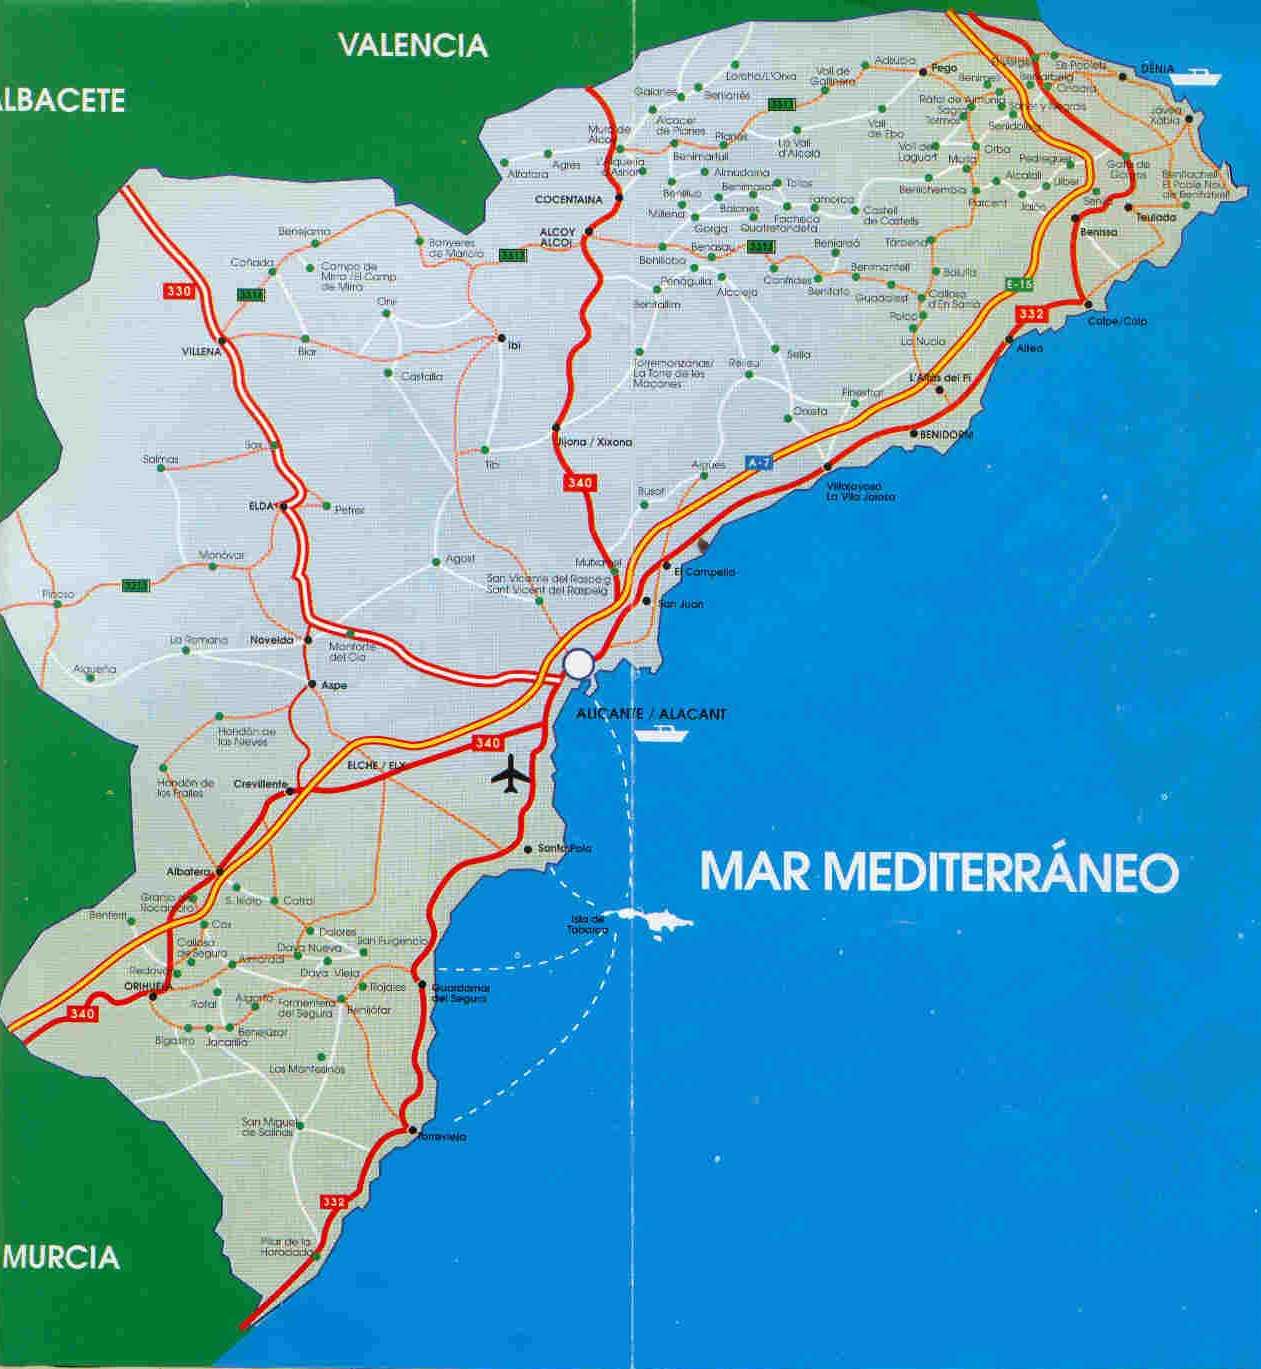 Province of Alicante road map